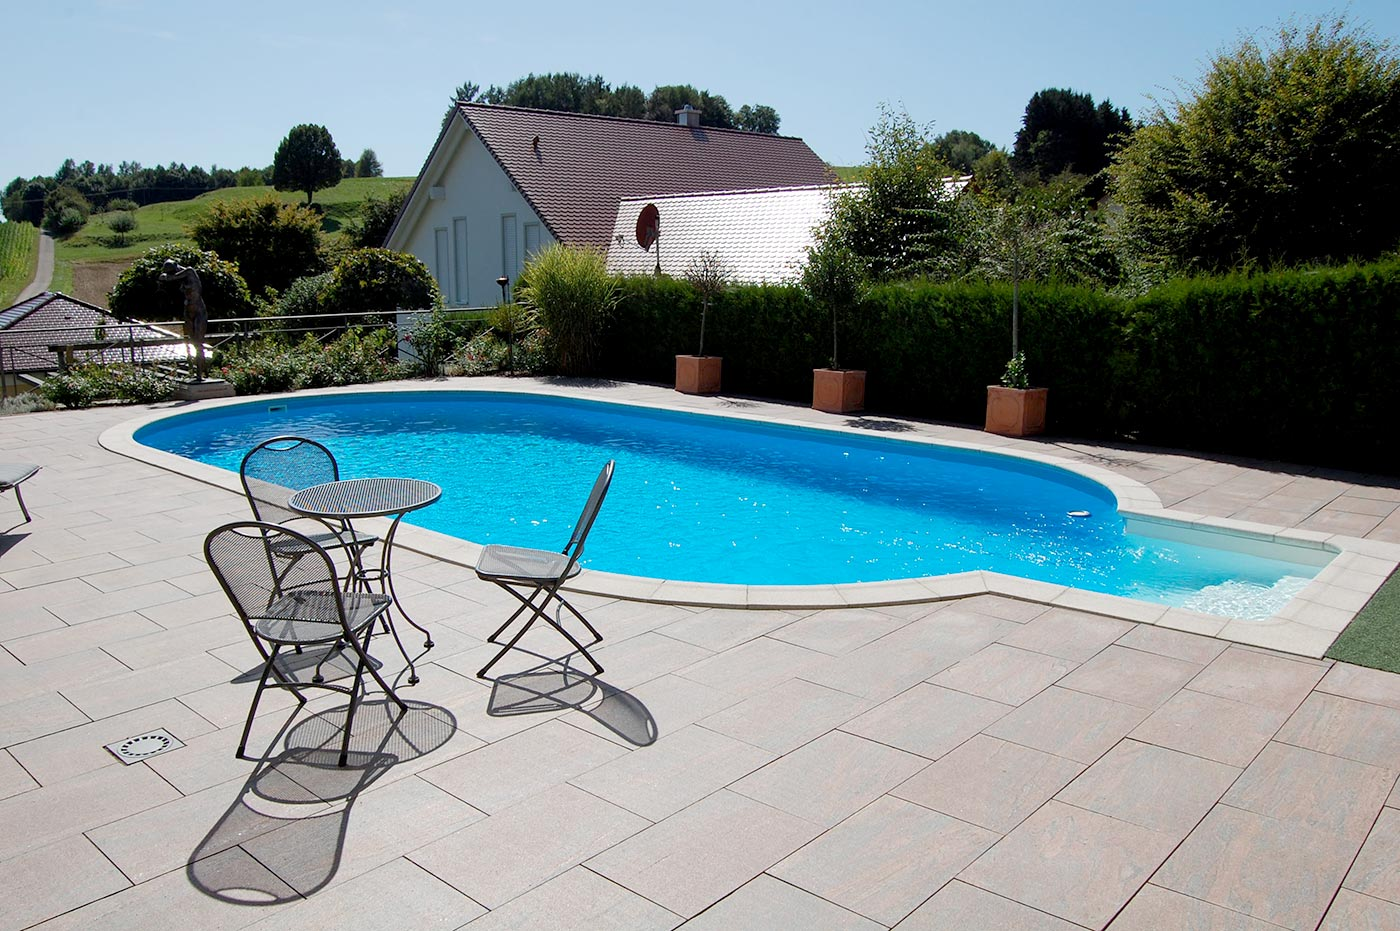 Pools stahlwandpools pool mit stahlwand for Garten pool stahlwand